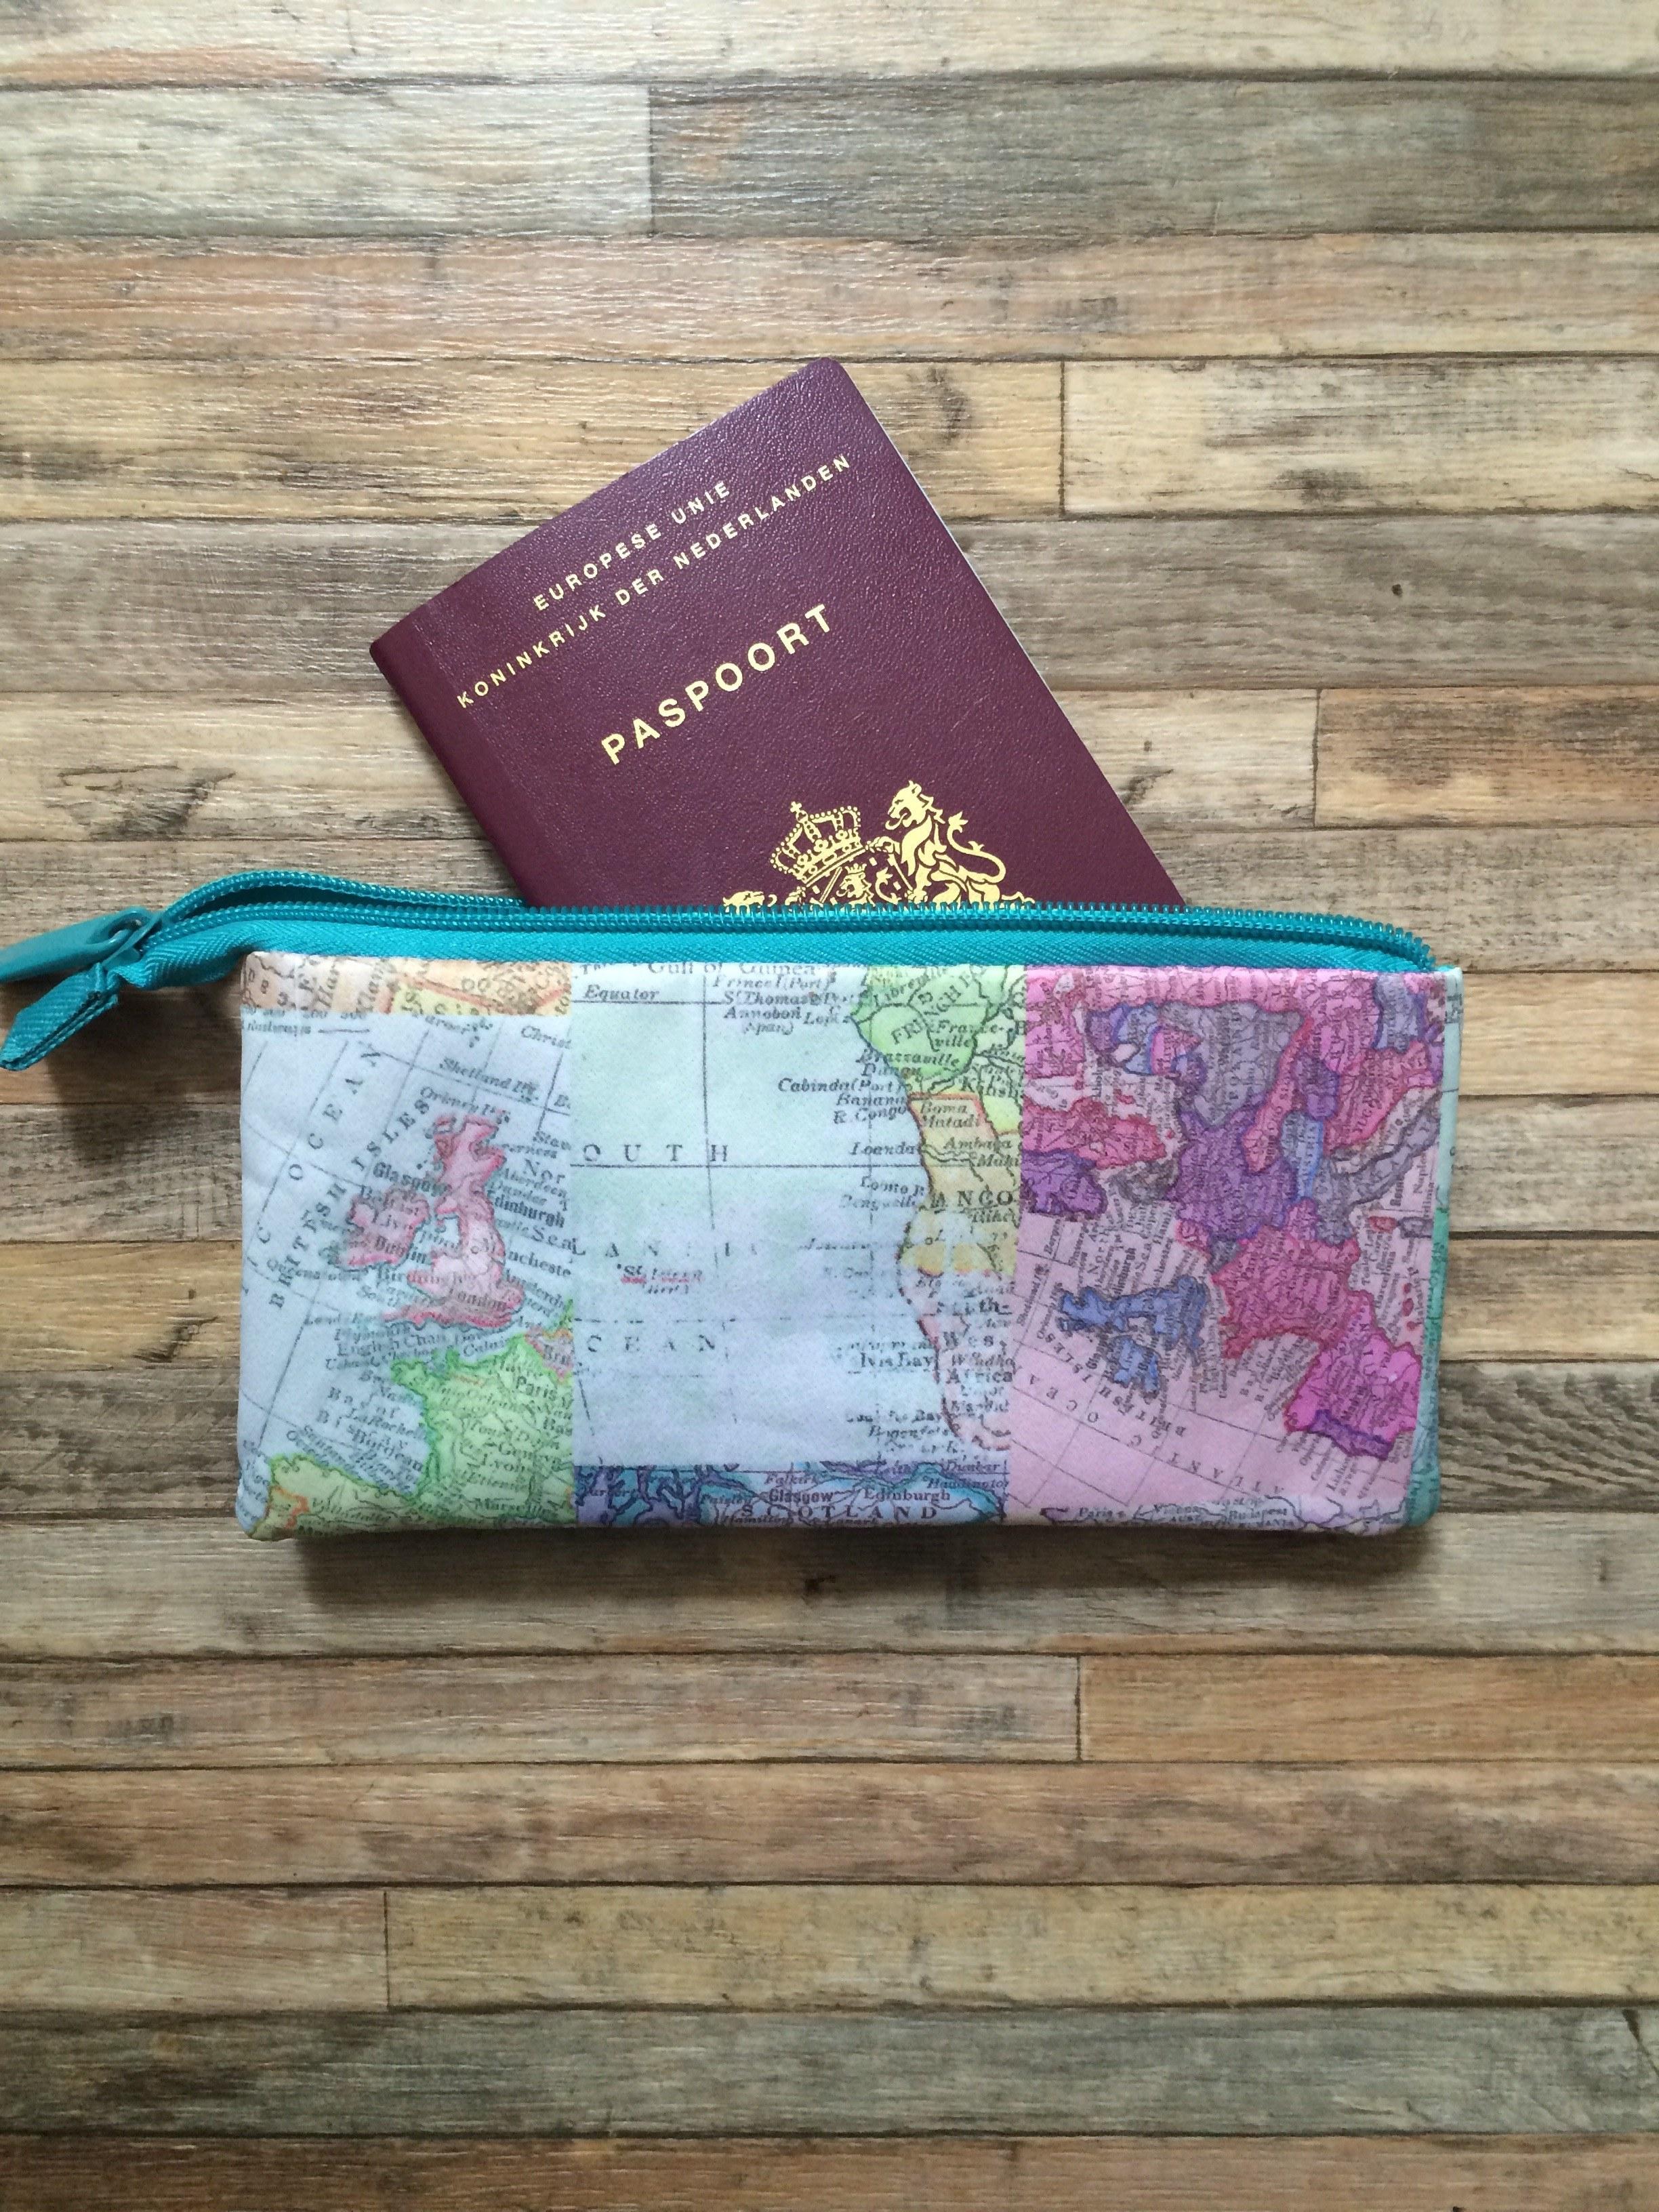 Blog Denise: wat doet een reisblogger?